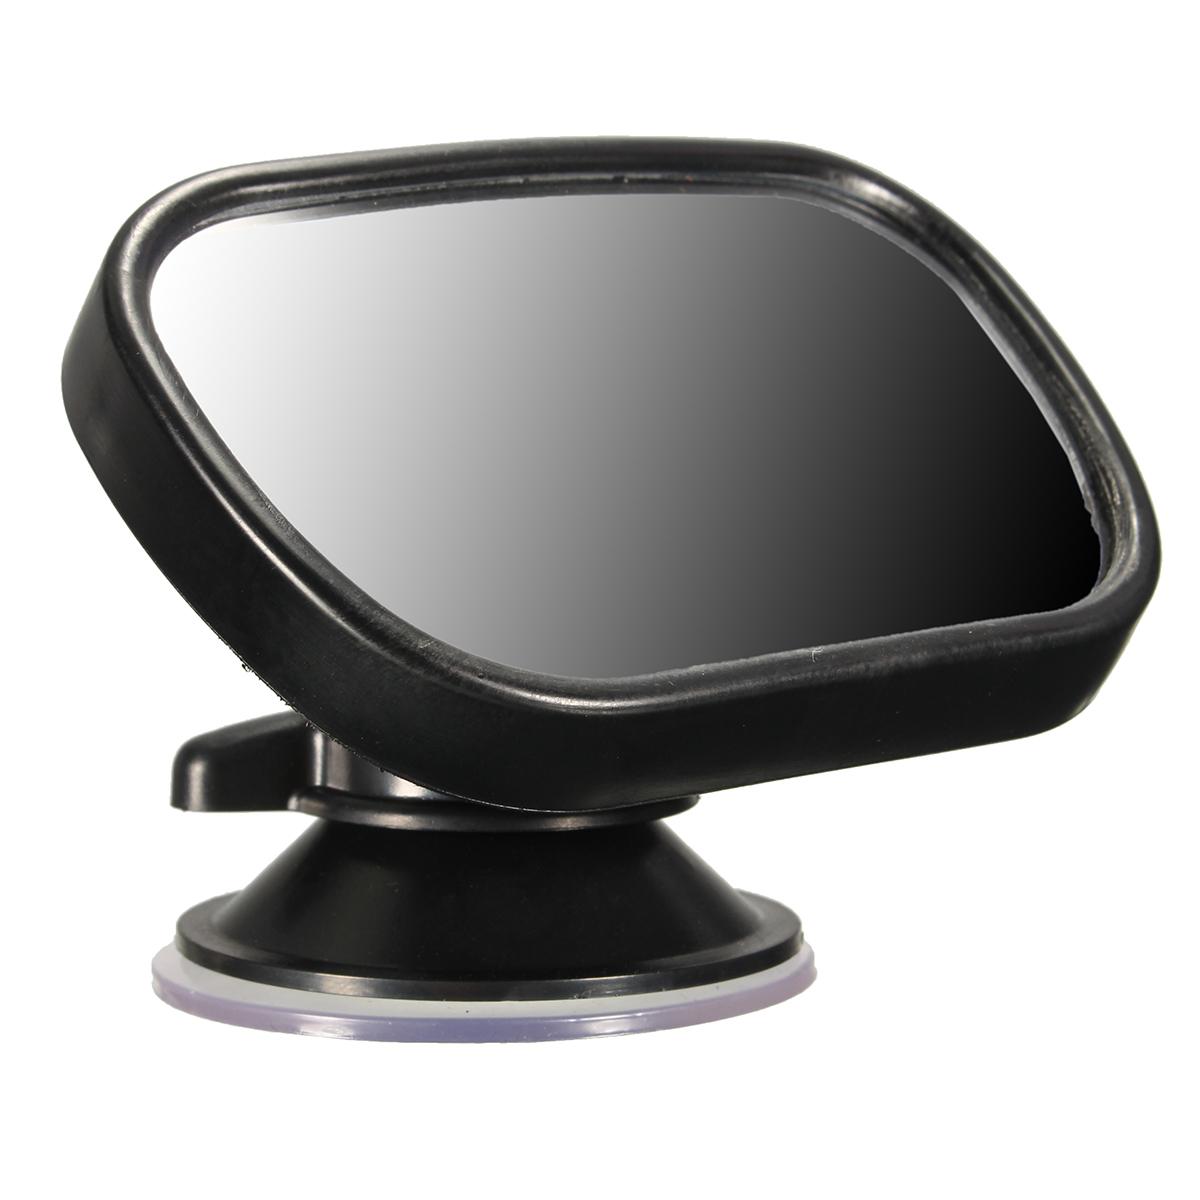 Tirol Adjustable Acrylic Car Rear View Baby Mirror Visor Clip Windscreen Suction